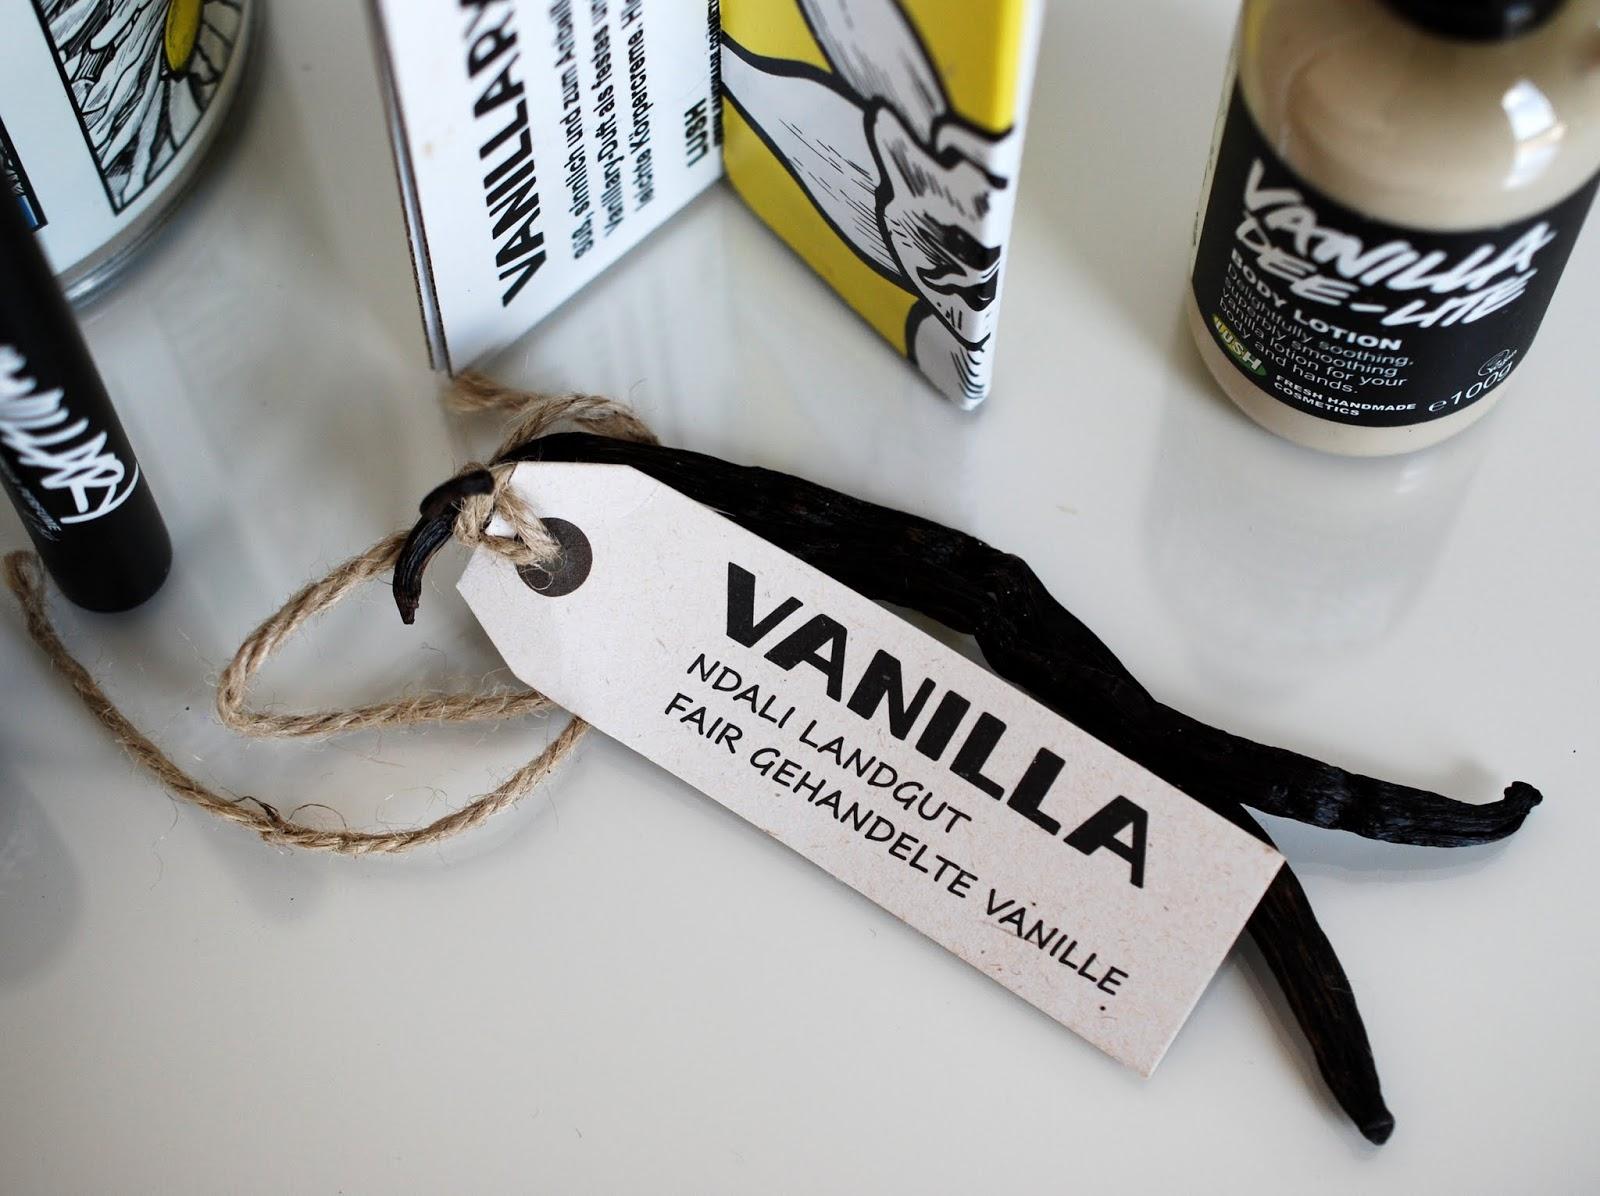 Ndali Landgut Fair Trade Vanilleschoten Lush Vanillary